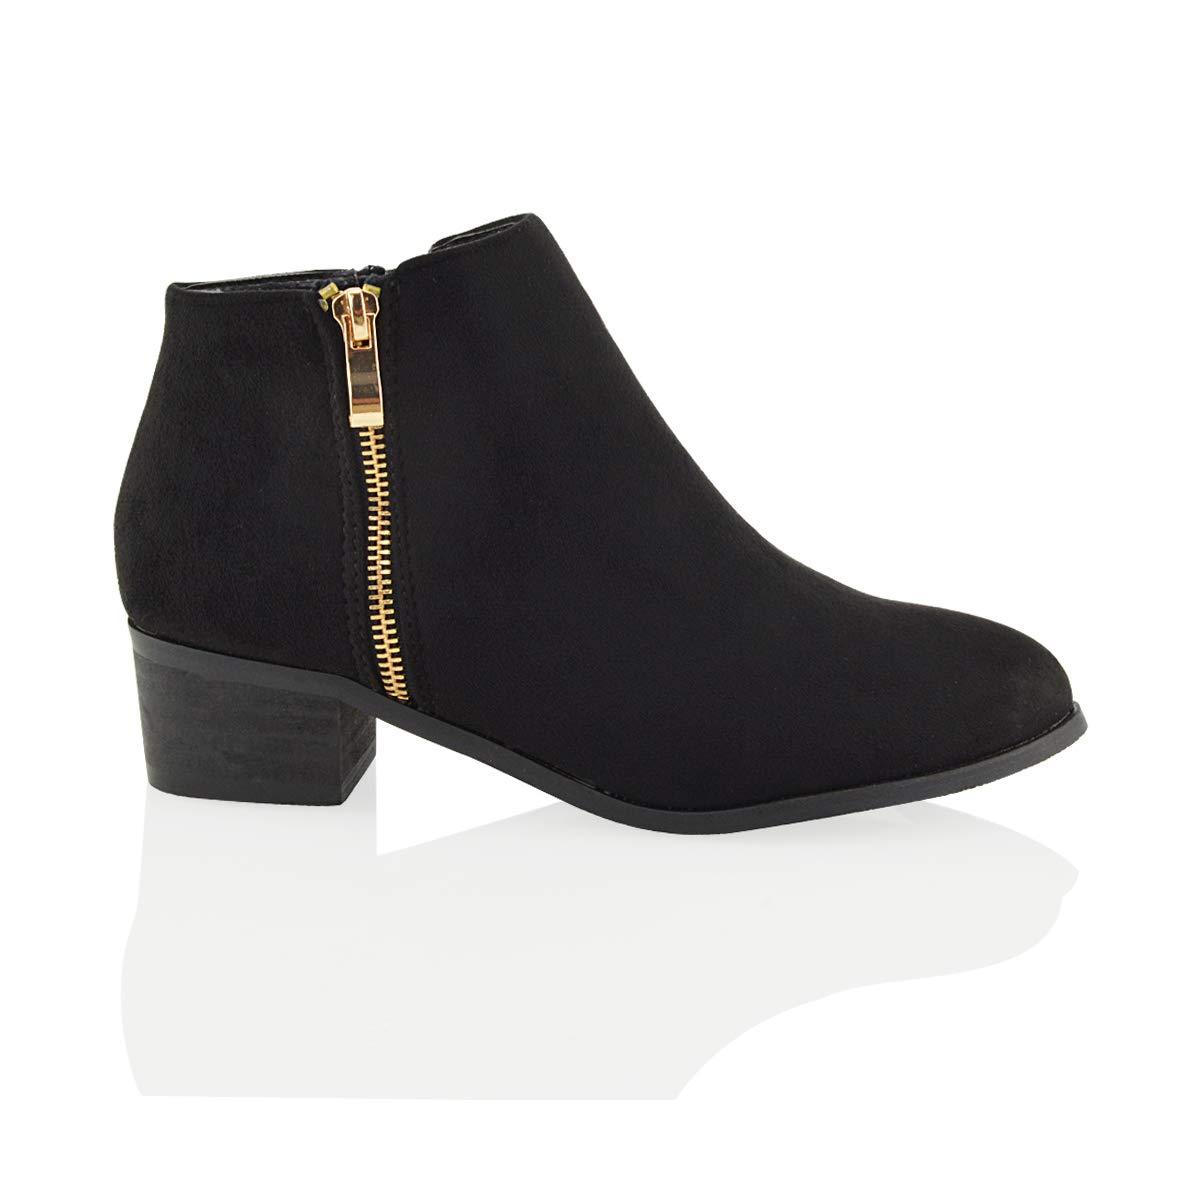 96f4e67cd90 Womens Ladies Low Heel Block Cowboy Style Ladies Gold Zip Western Ankle  Boots